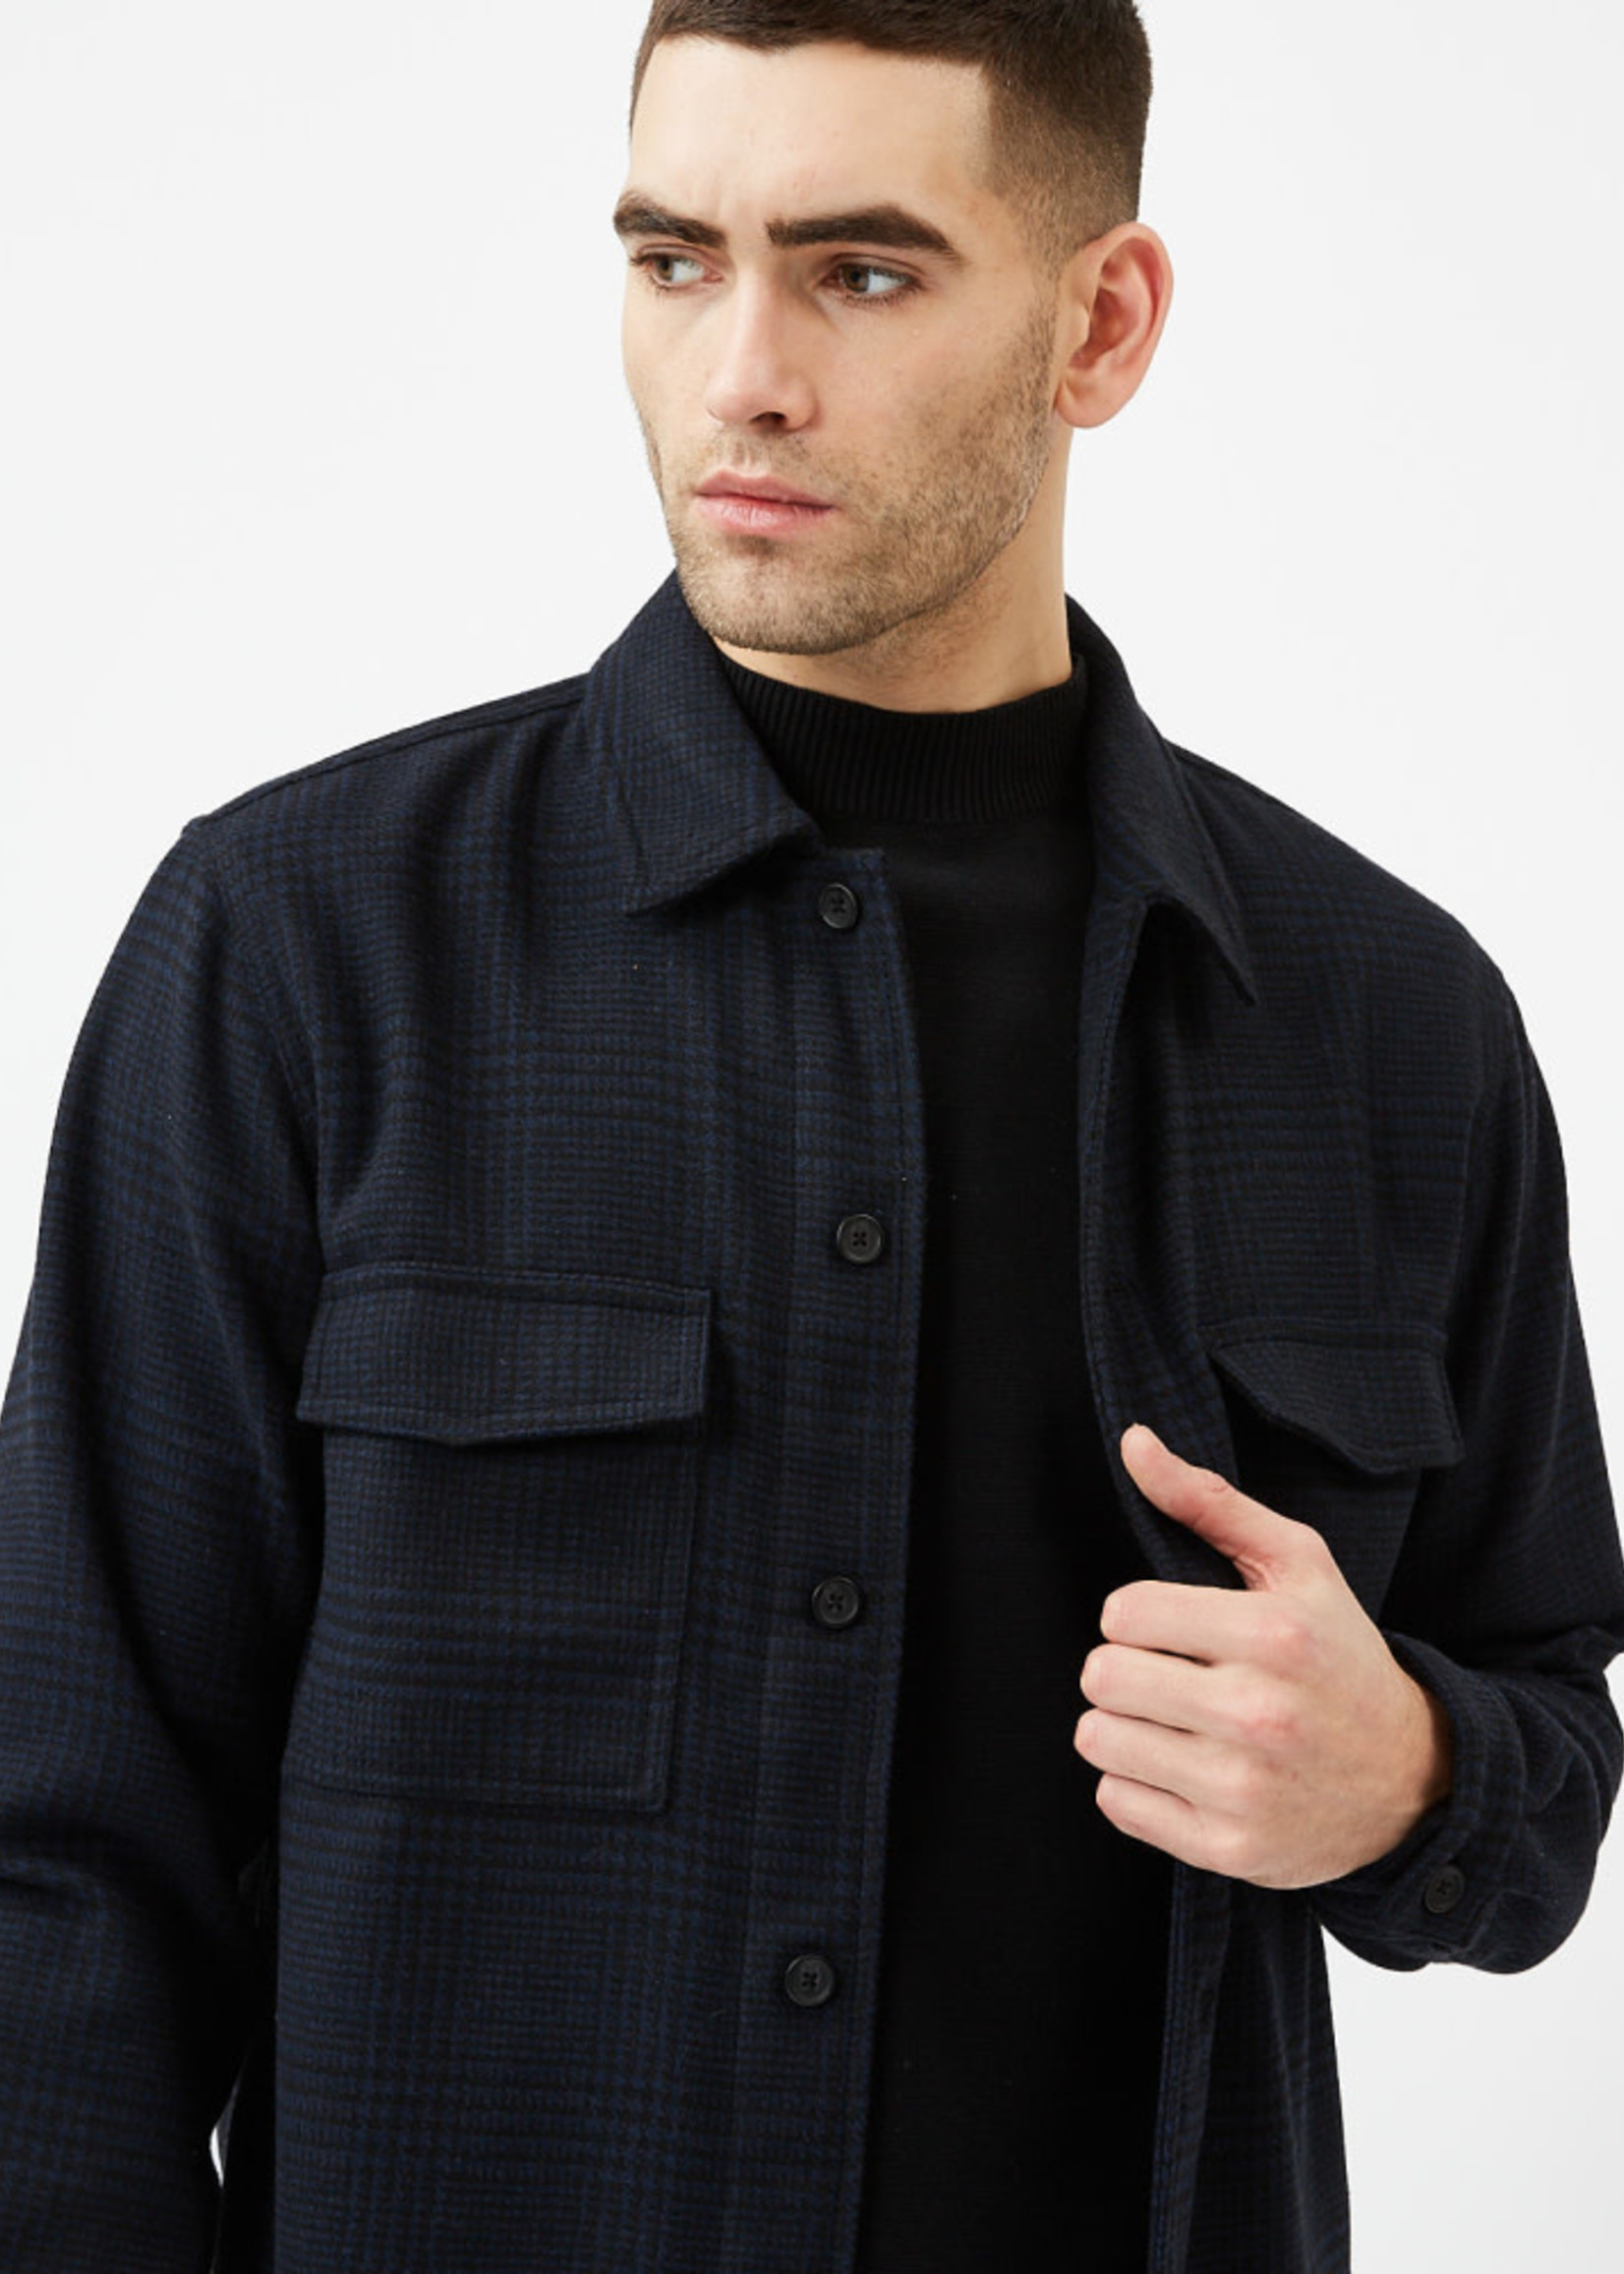 MINIMUM JAKKO over shirt